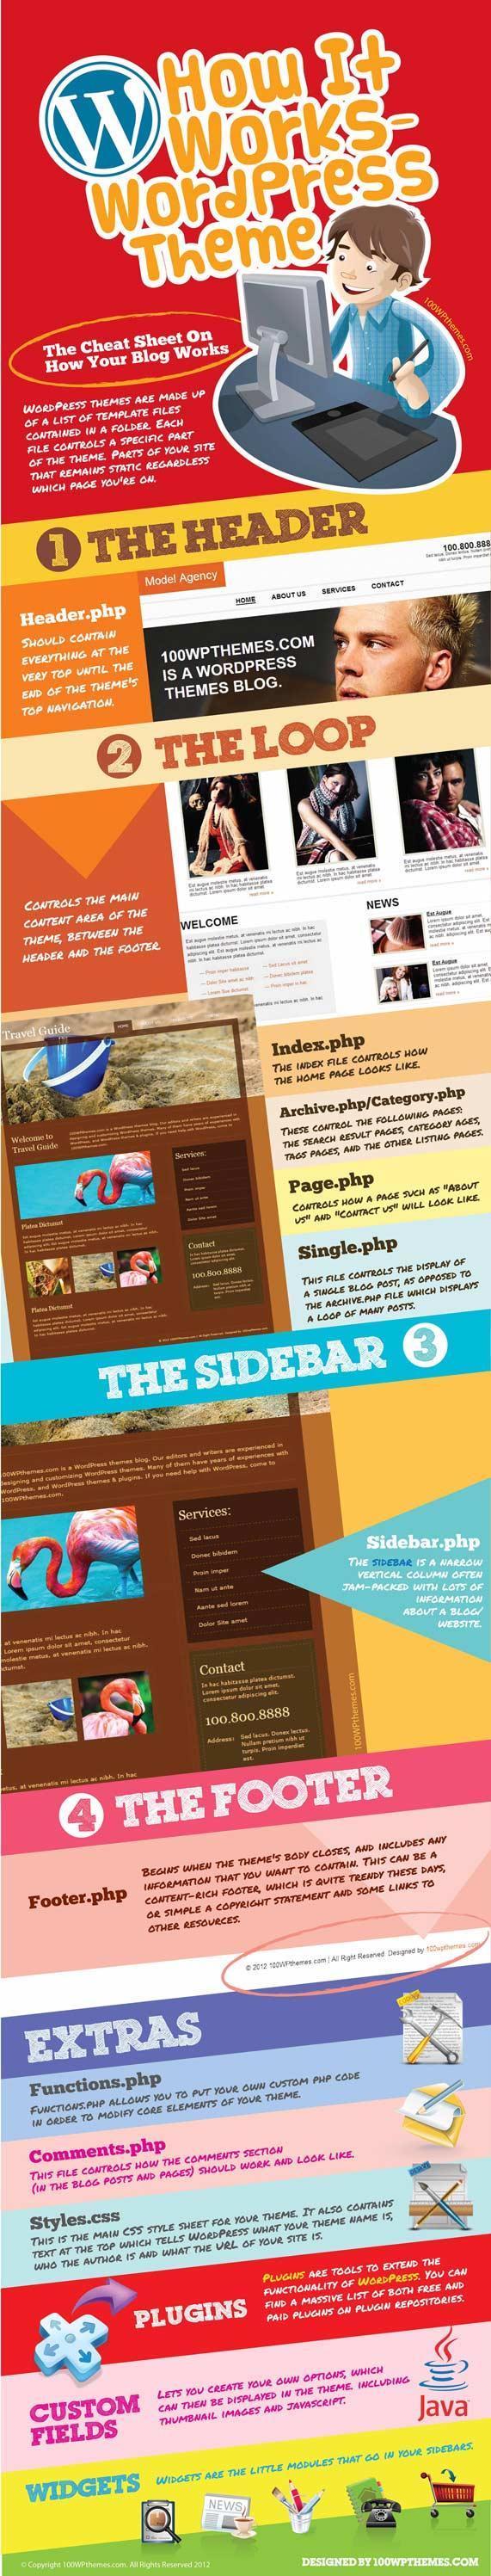 WordPress anatomy infographic   Web and Device Layout   Pinterest ...